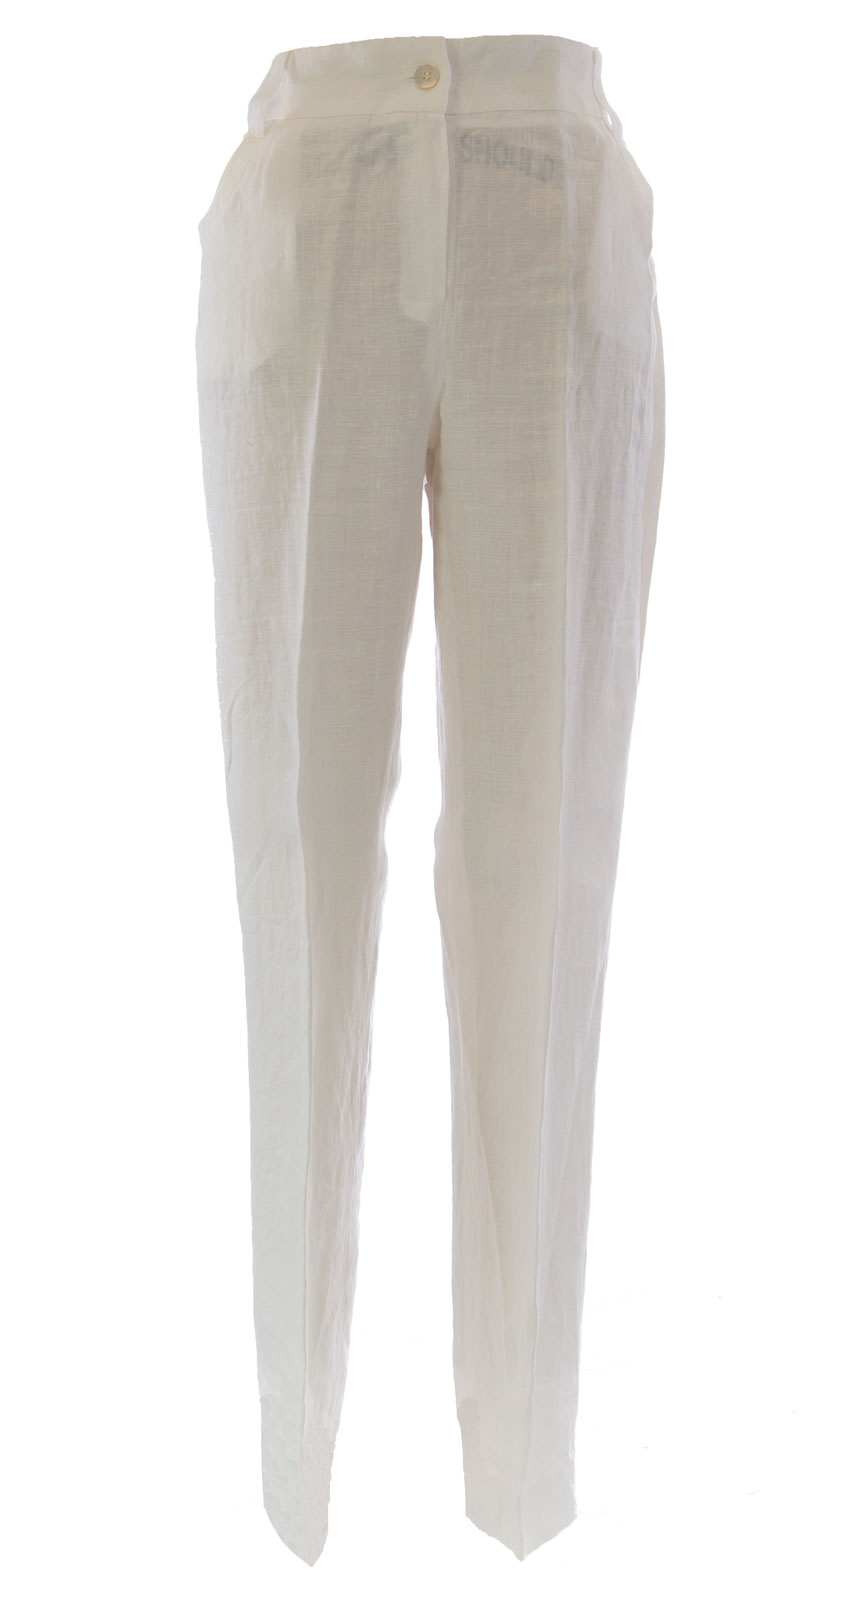 MARINA RINALDI by MaxMara Berno White Elastic Waist Dress Pants  385 NWT